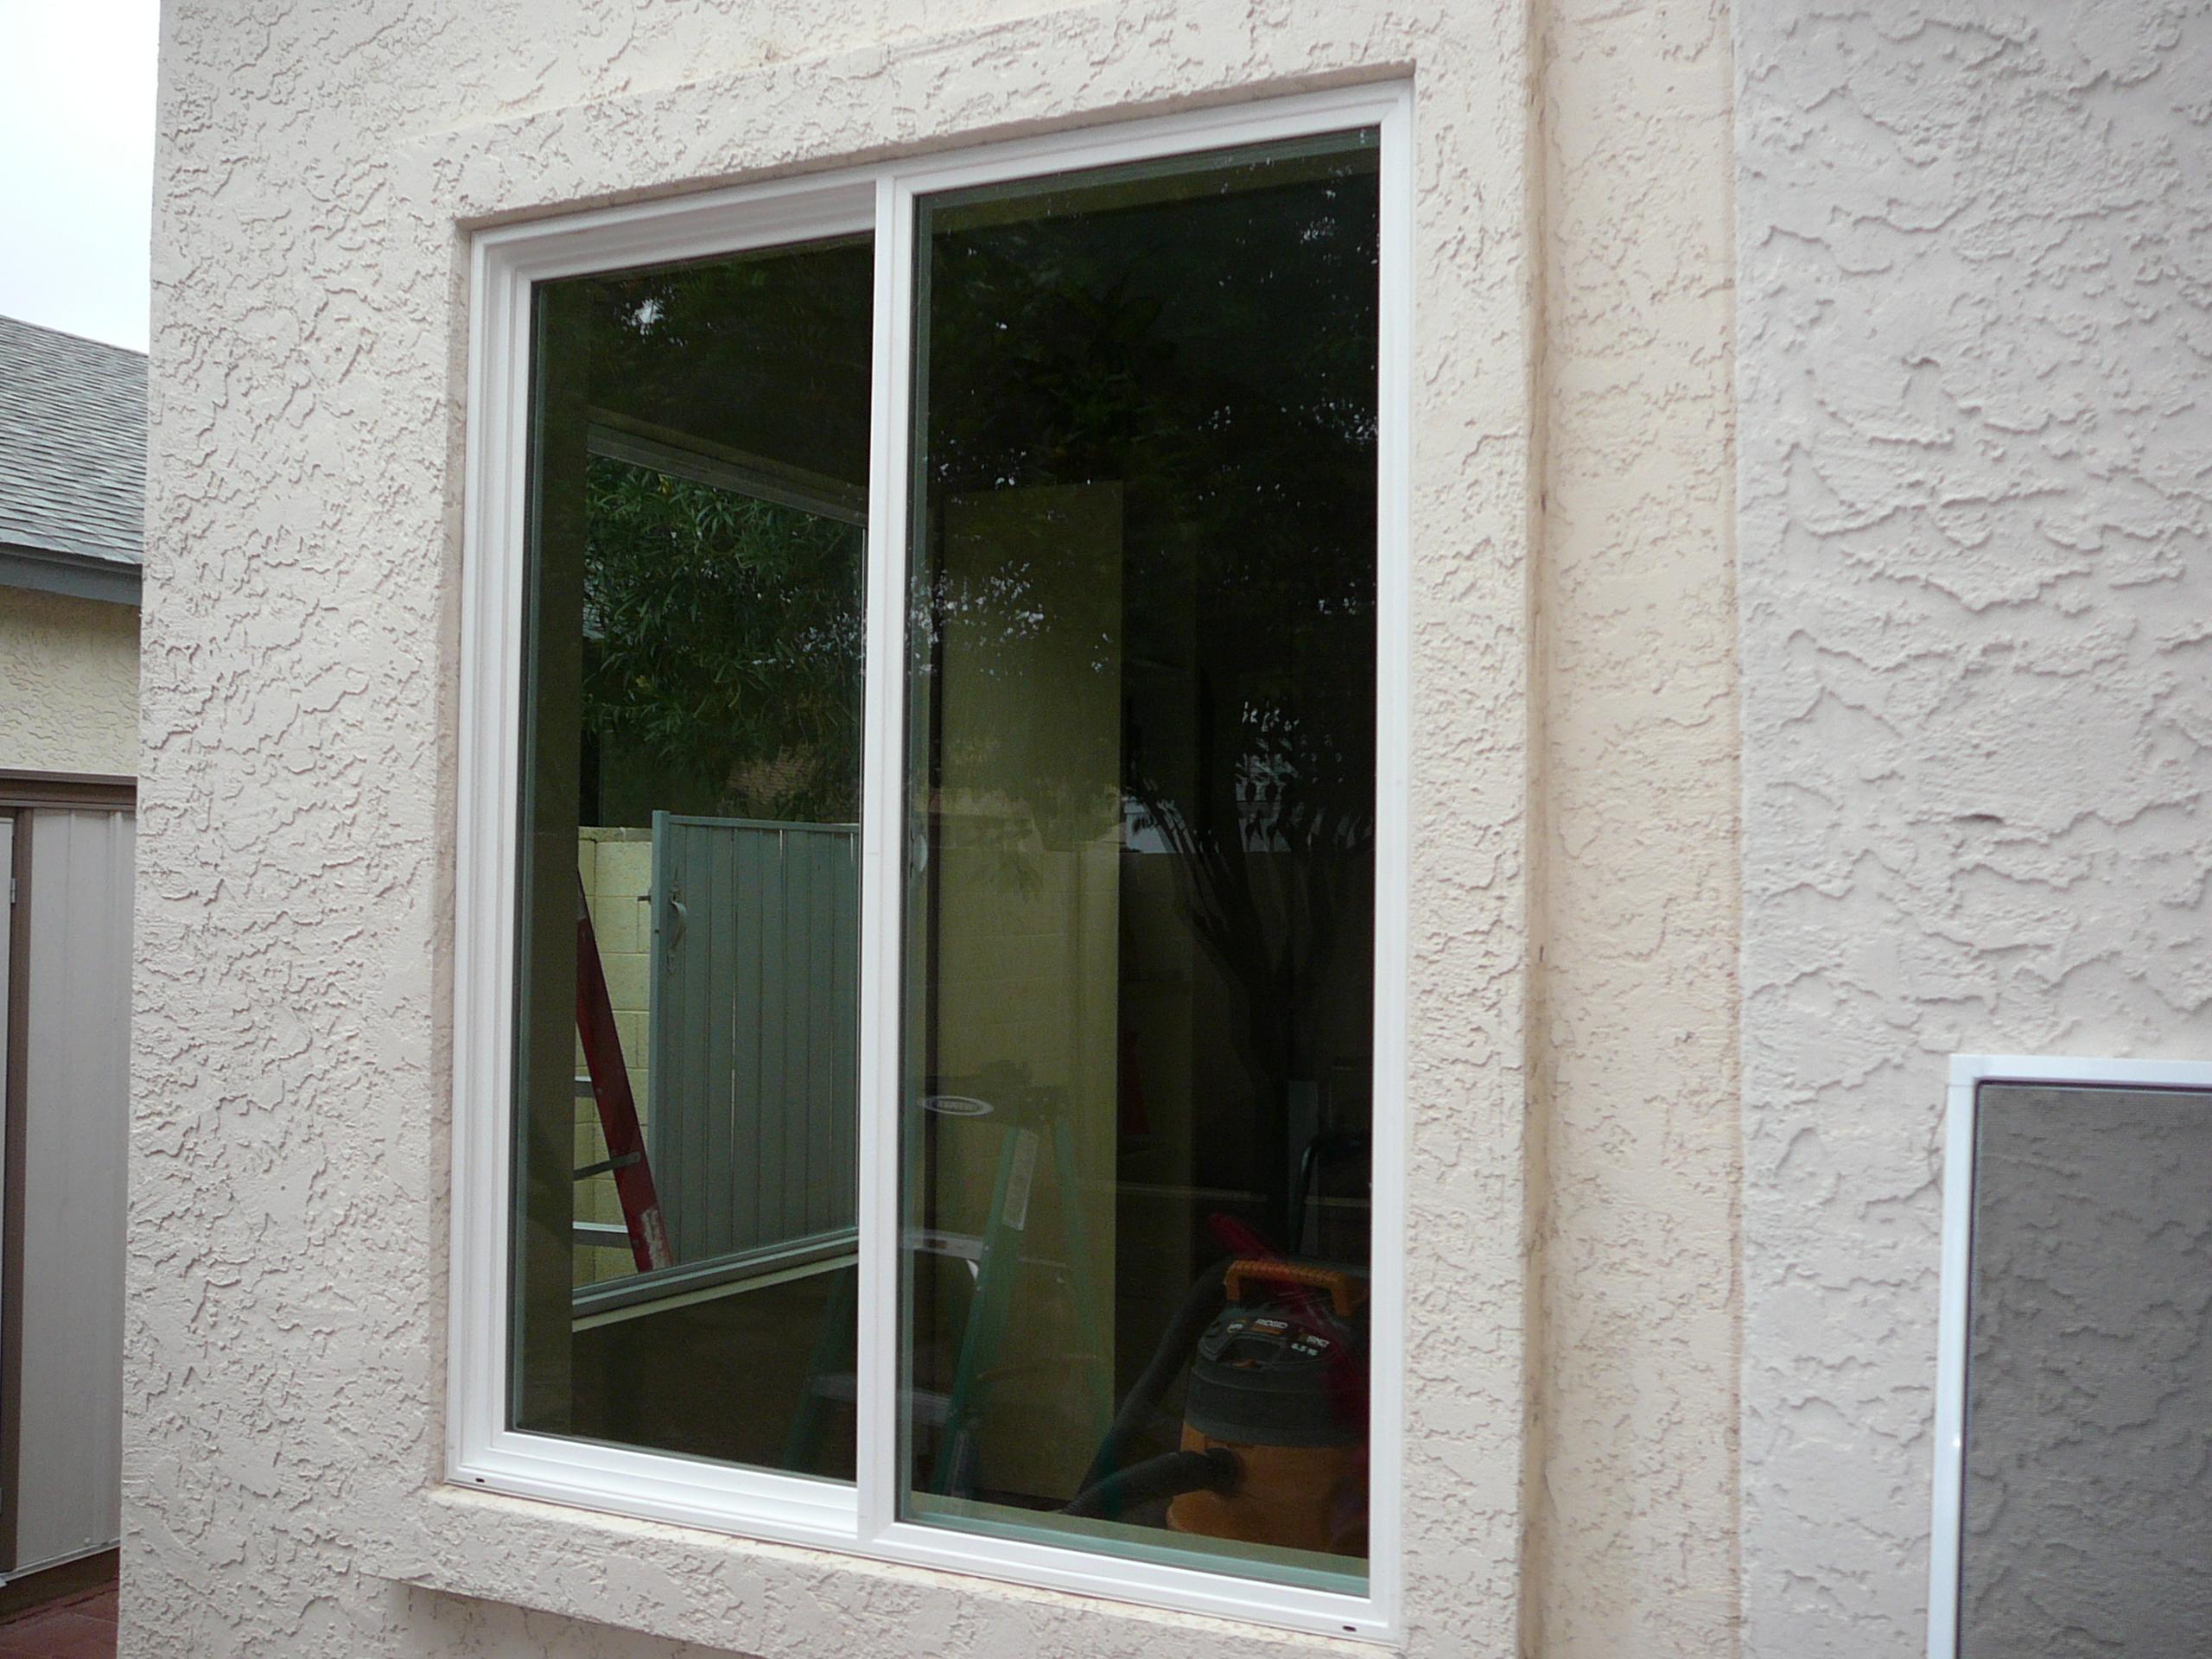 1920 #24271B Arizona's Best Windows. Quality Replacement Windows & Doors picture/photo Best Quality Doors 39592560